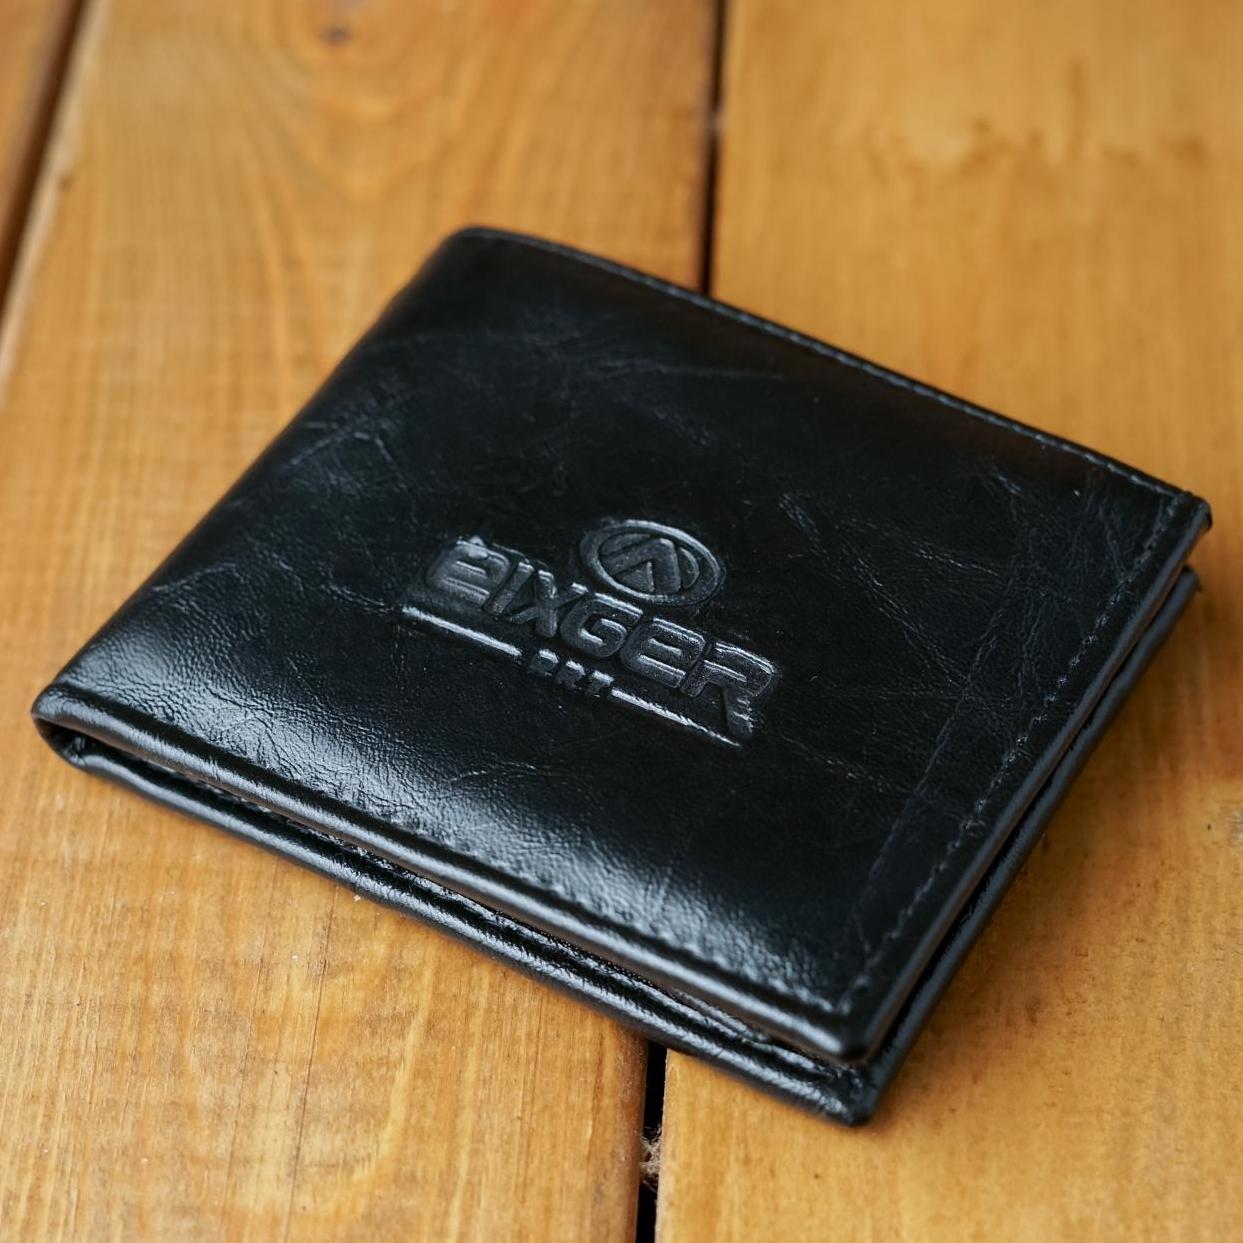 Dompet pria kulit sintetis minimalis-Dompet classic elegant-Dompet lipat 2- Dompet murah 0662807124